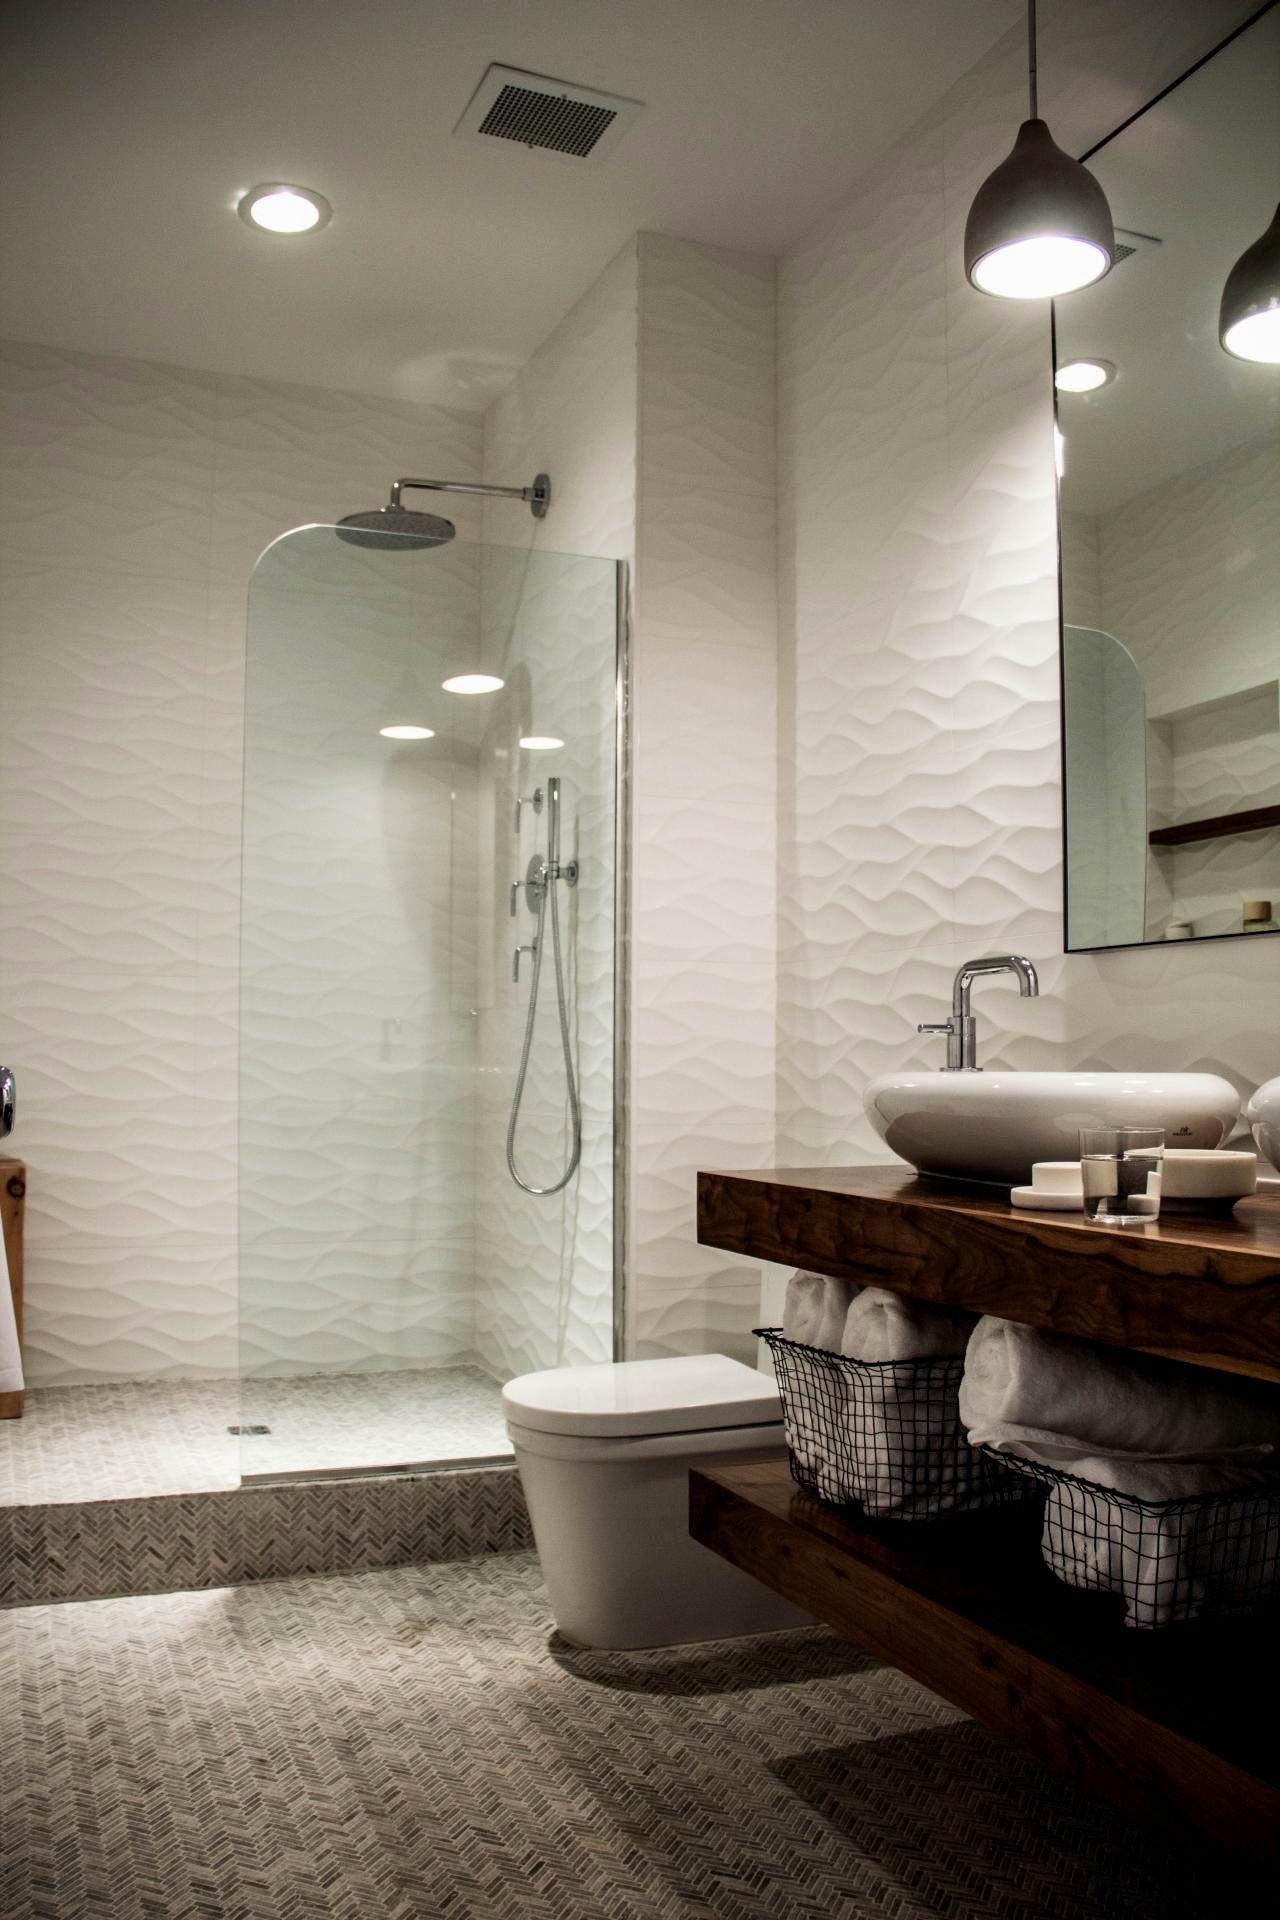 fresh bathroom sink vanity pattern-Stunning Bathroom Sink Vanity Portrait